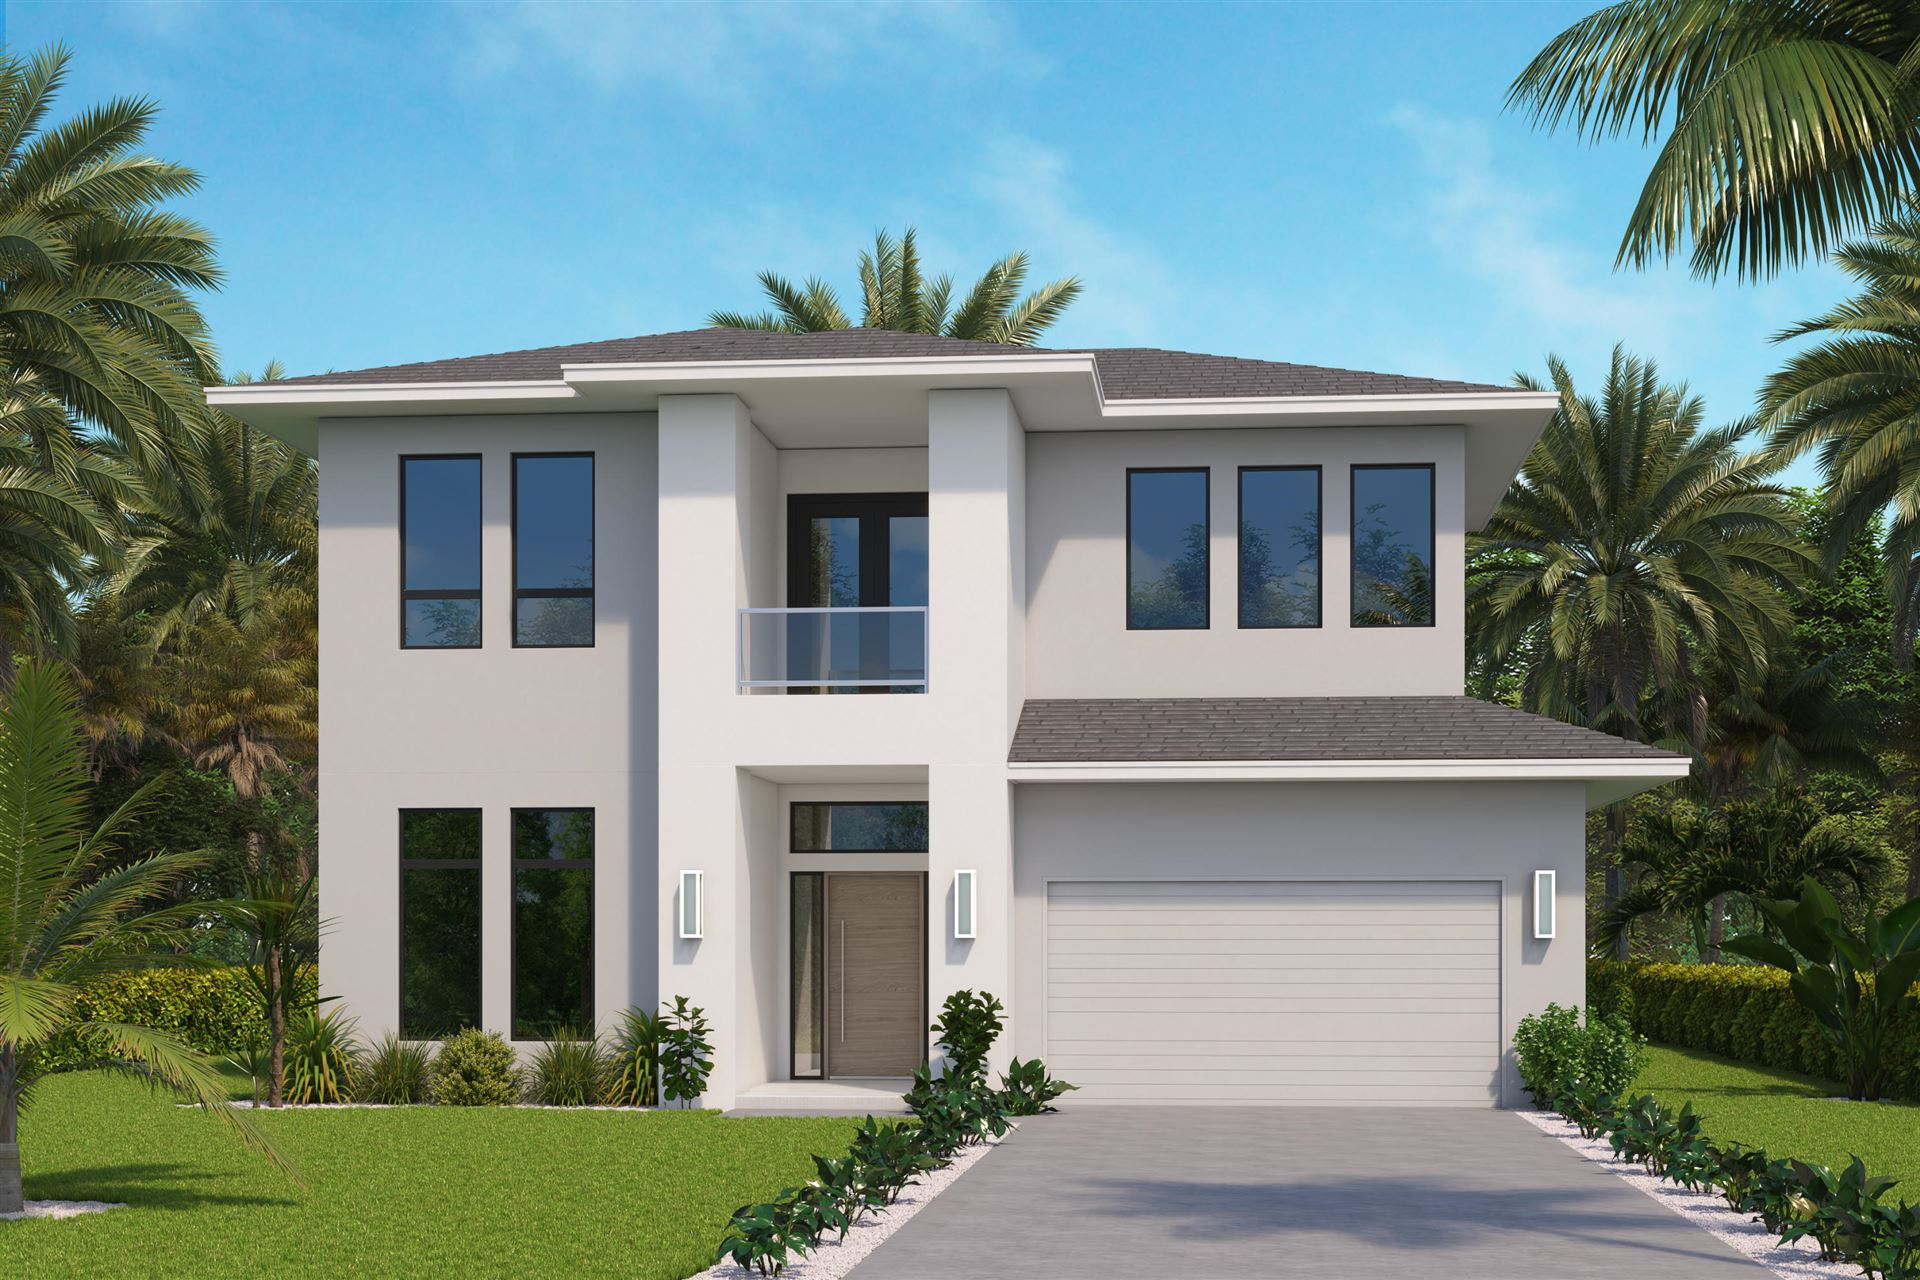 Photo of 3000 Blue Cypress Lane, Wellington, FL 33414 (MLS # RX-10716834)